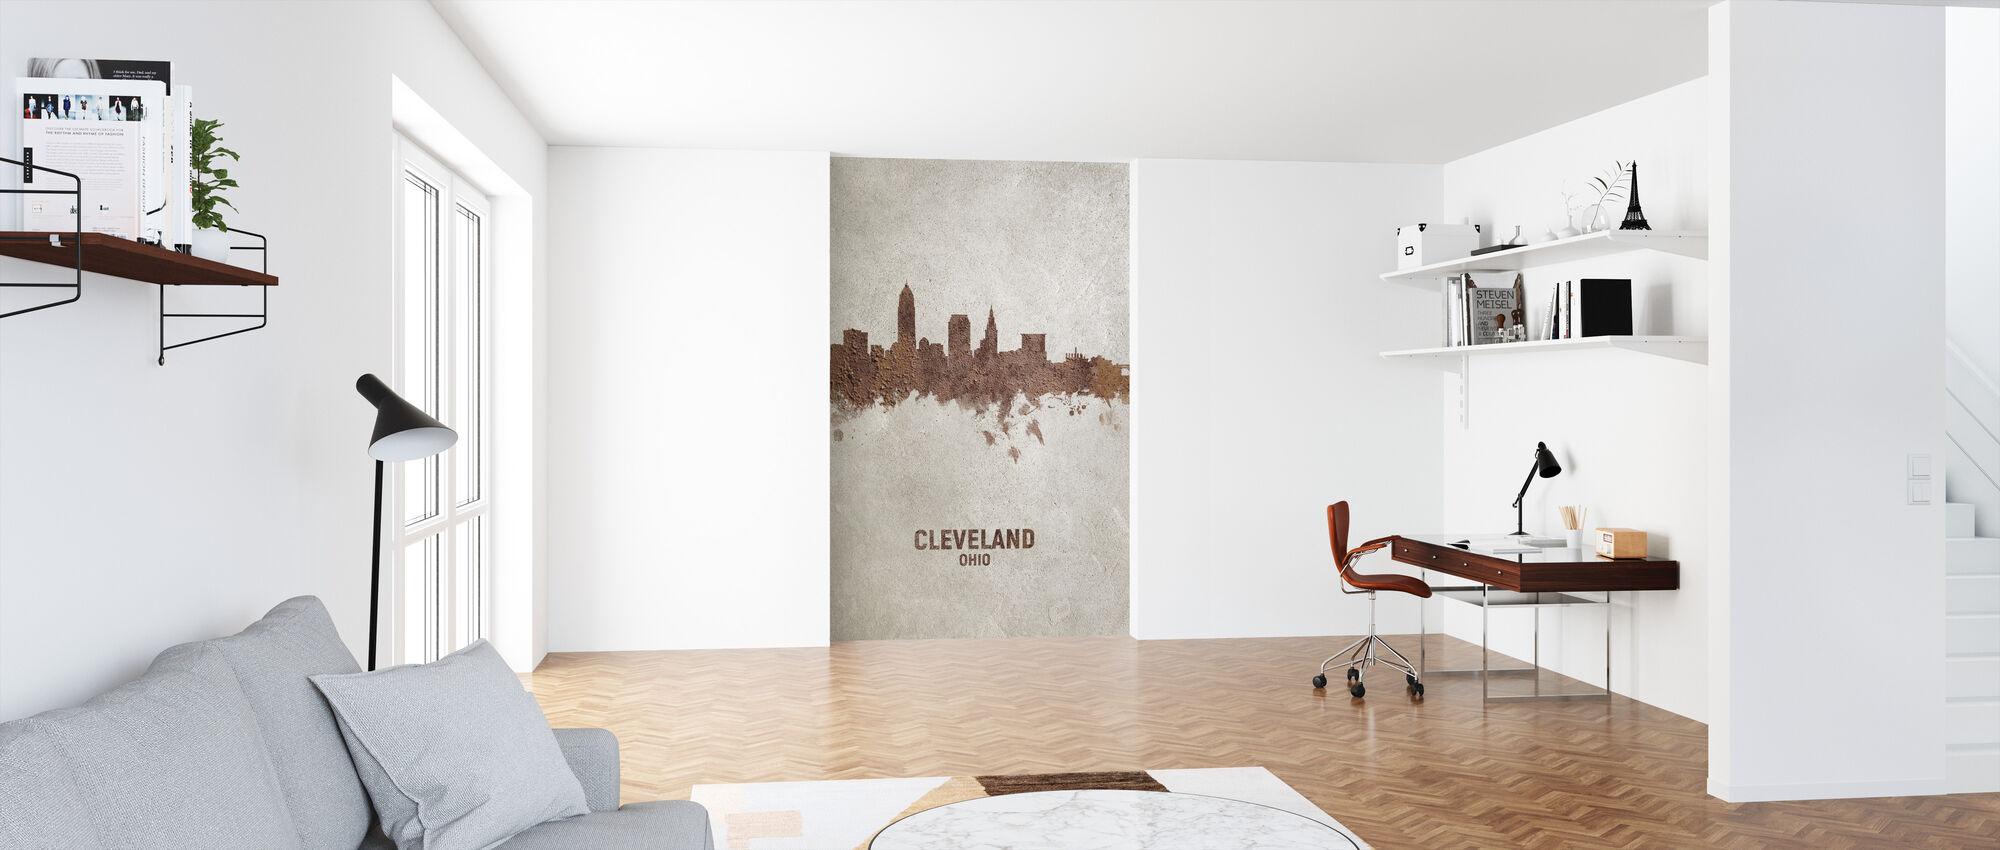 Cleveland Ohio Rust Skyline - Wallpaper - Office